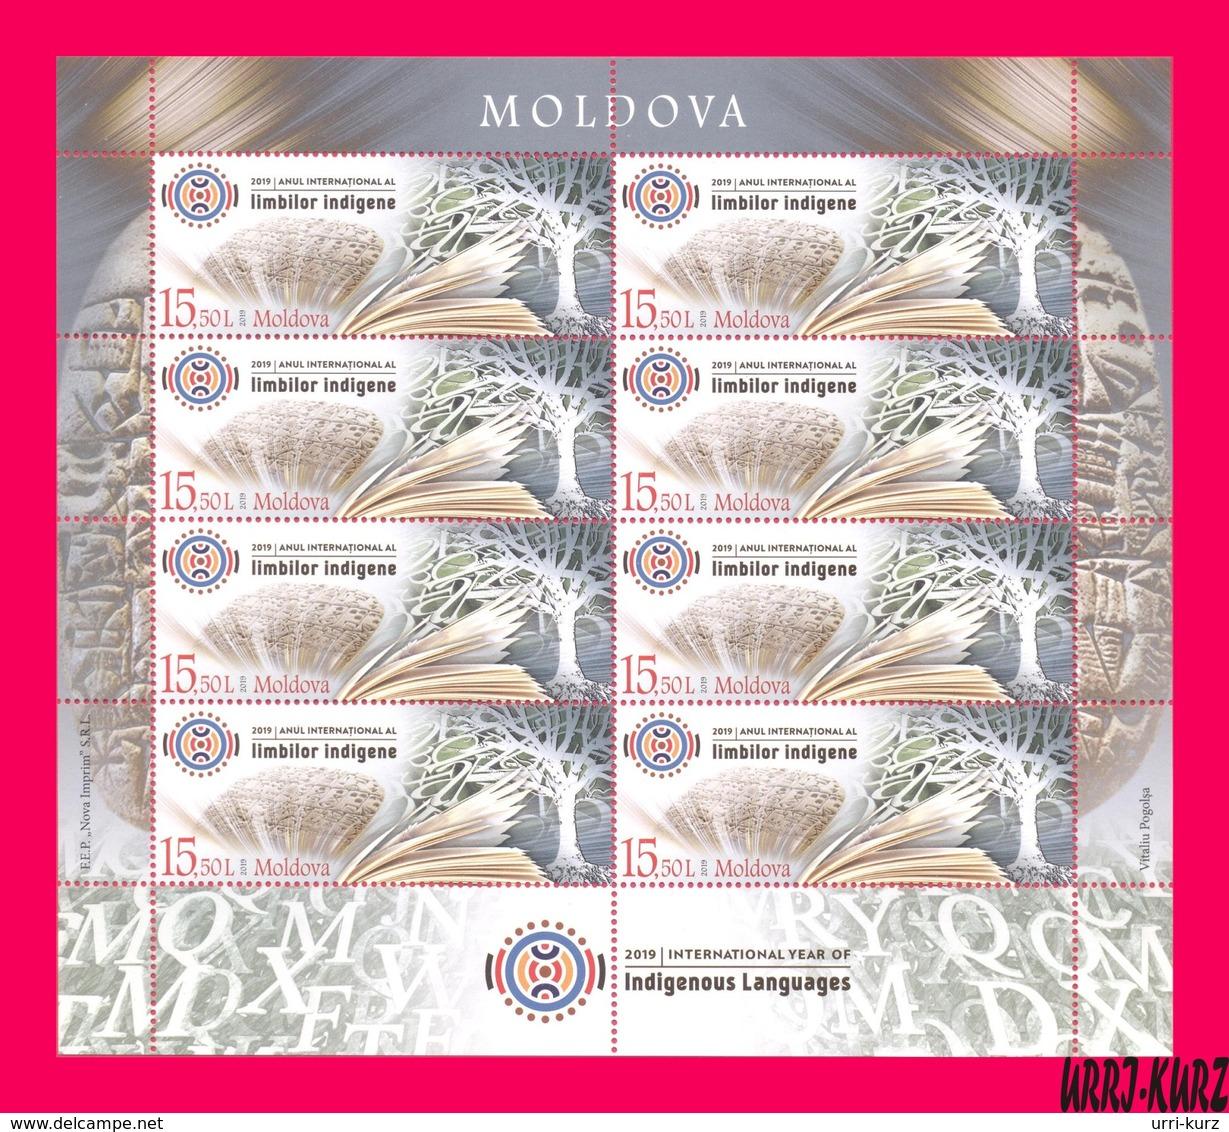 MOLDOVA 2019 International Year Of Indigenous Languages M-s Sc1036 Mi Klb.1101 MNH - Languages